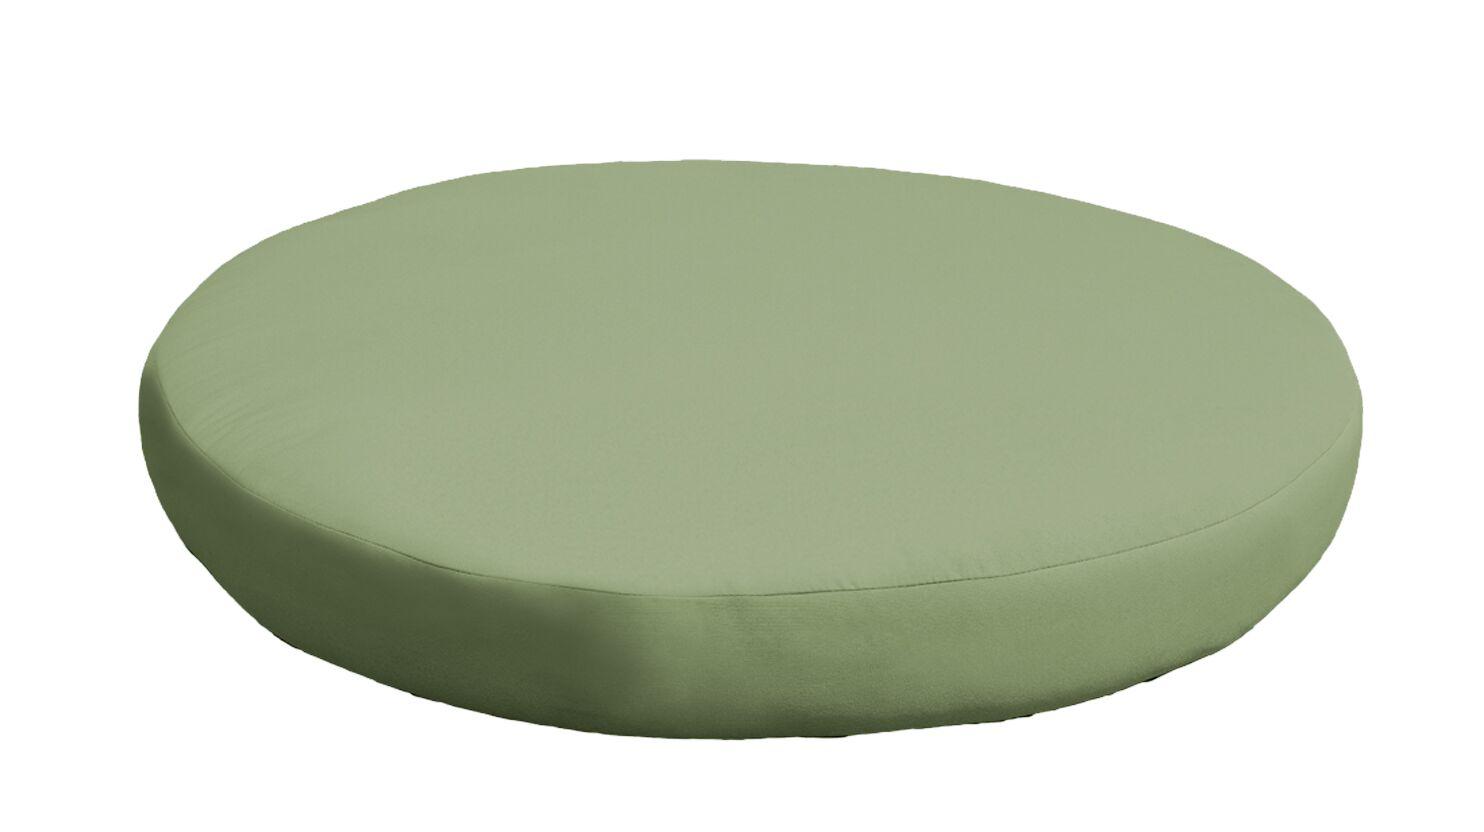 Outdoor Ottoman Cushion Fabric: Cilantro